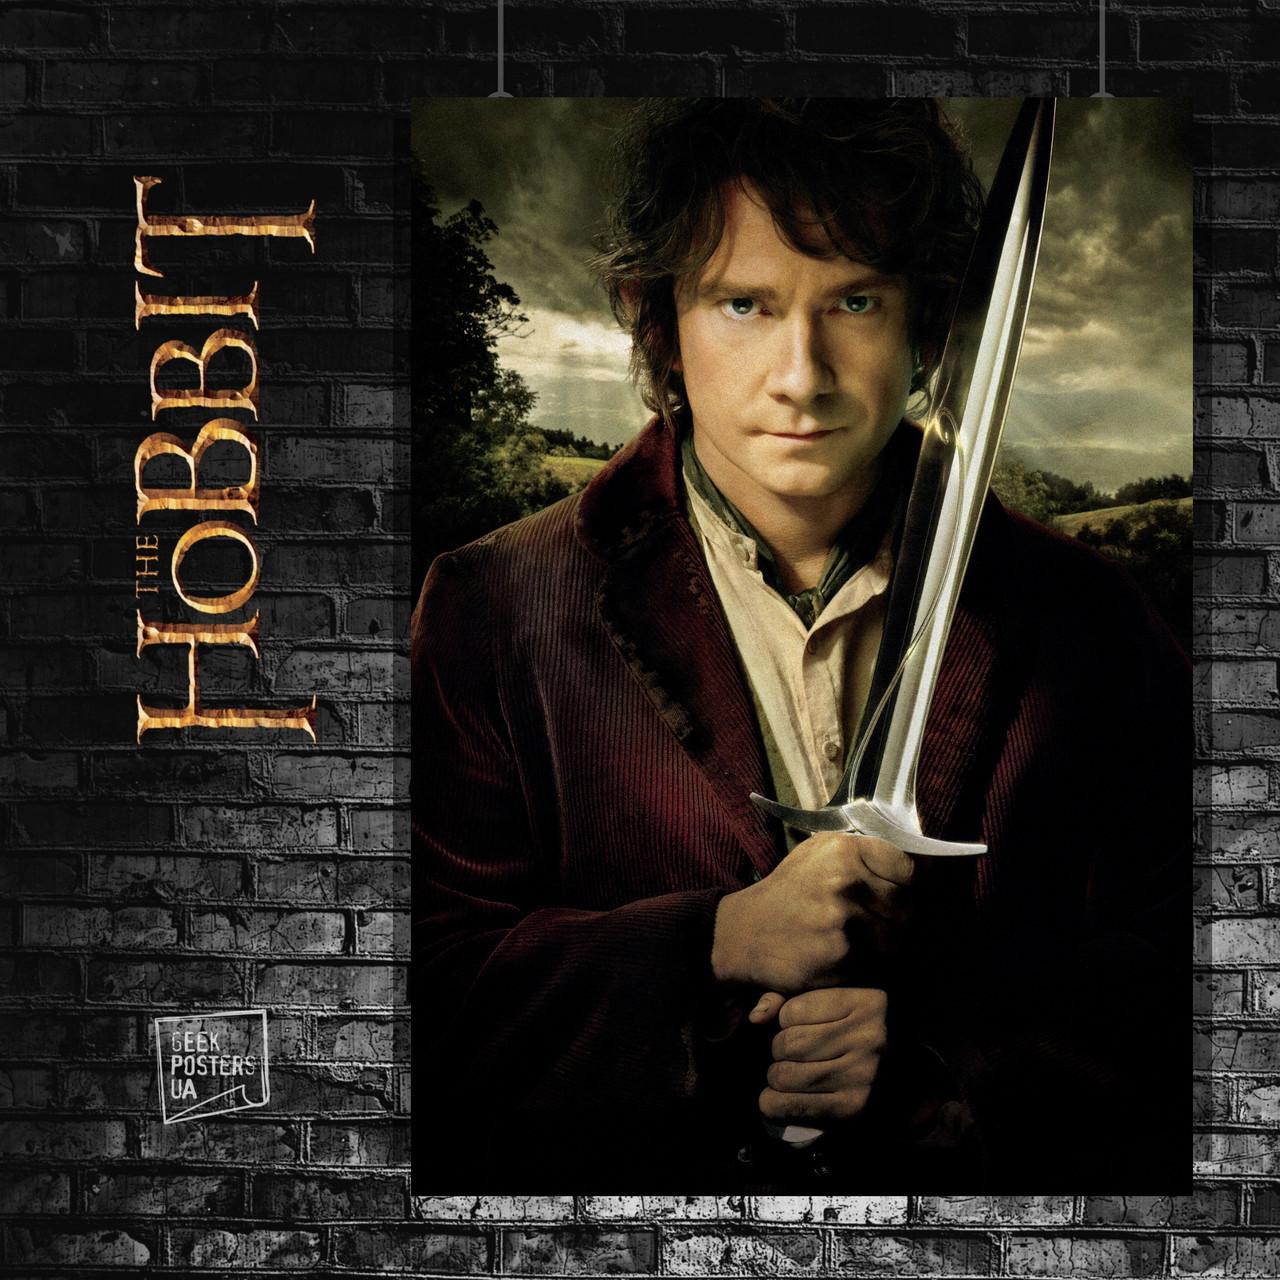 Постер Властелин Колец, Lord Of The Rings, Хоббит, Hobbit, LOTR. Размер 60x43см (A2). Глянцевая бумага